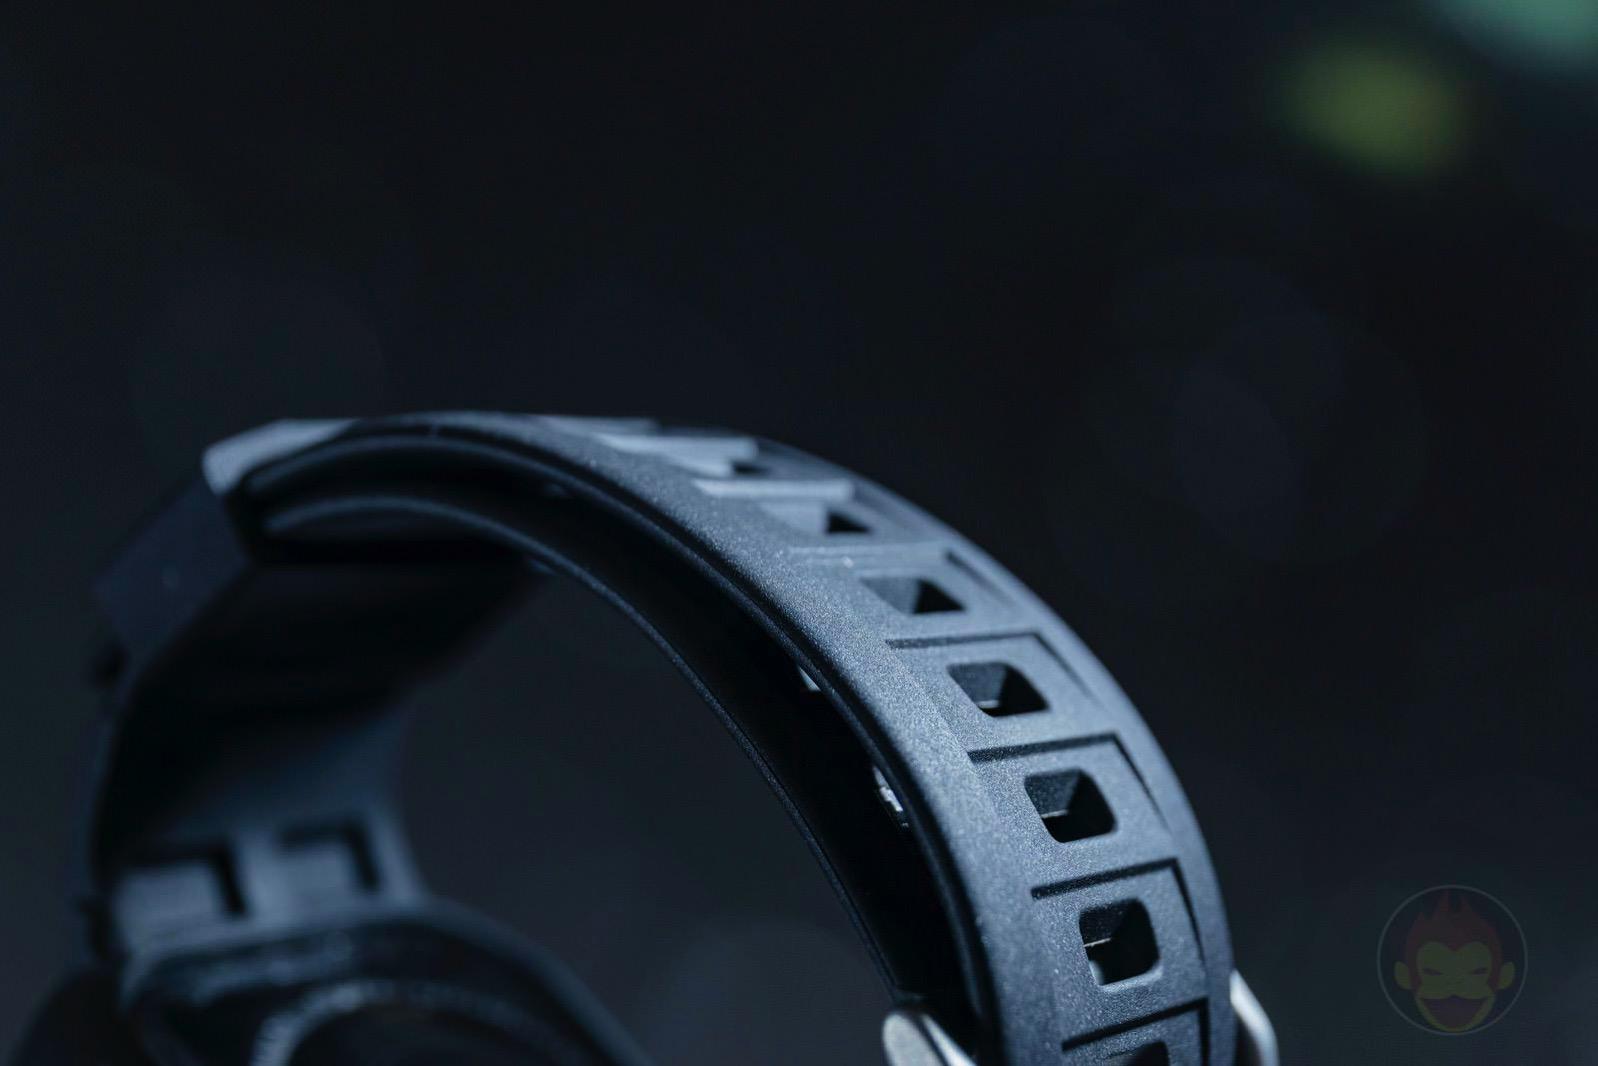 Spigen-Rugged-Armor-Pro-Apple-Watch-Band-and-case-08.jpg